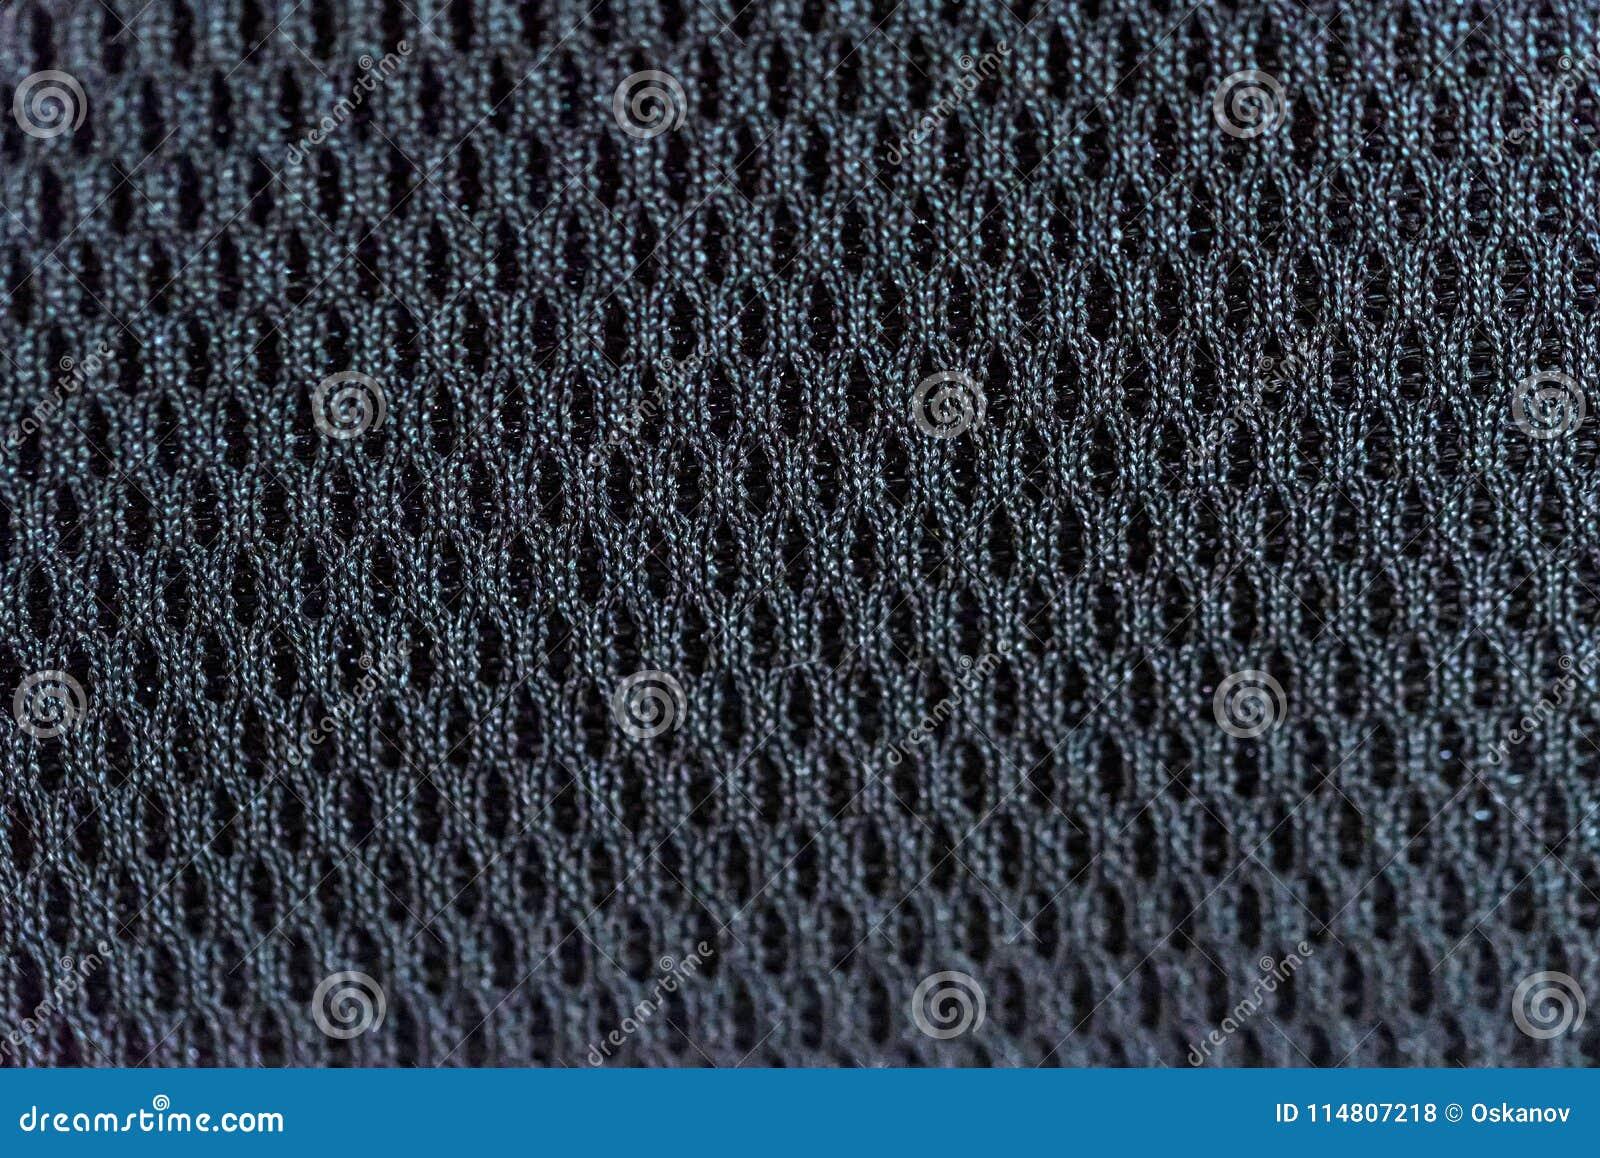 c01da829f7e019 Dark Car Textile Macro Texture Stock Photo - Image of gray